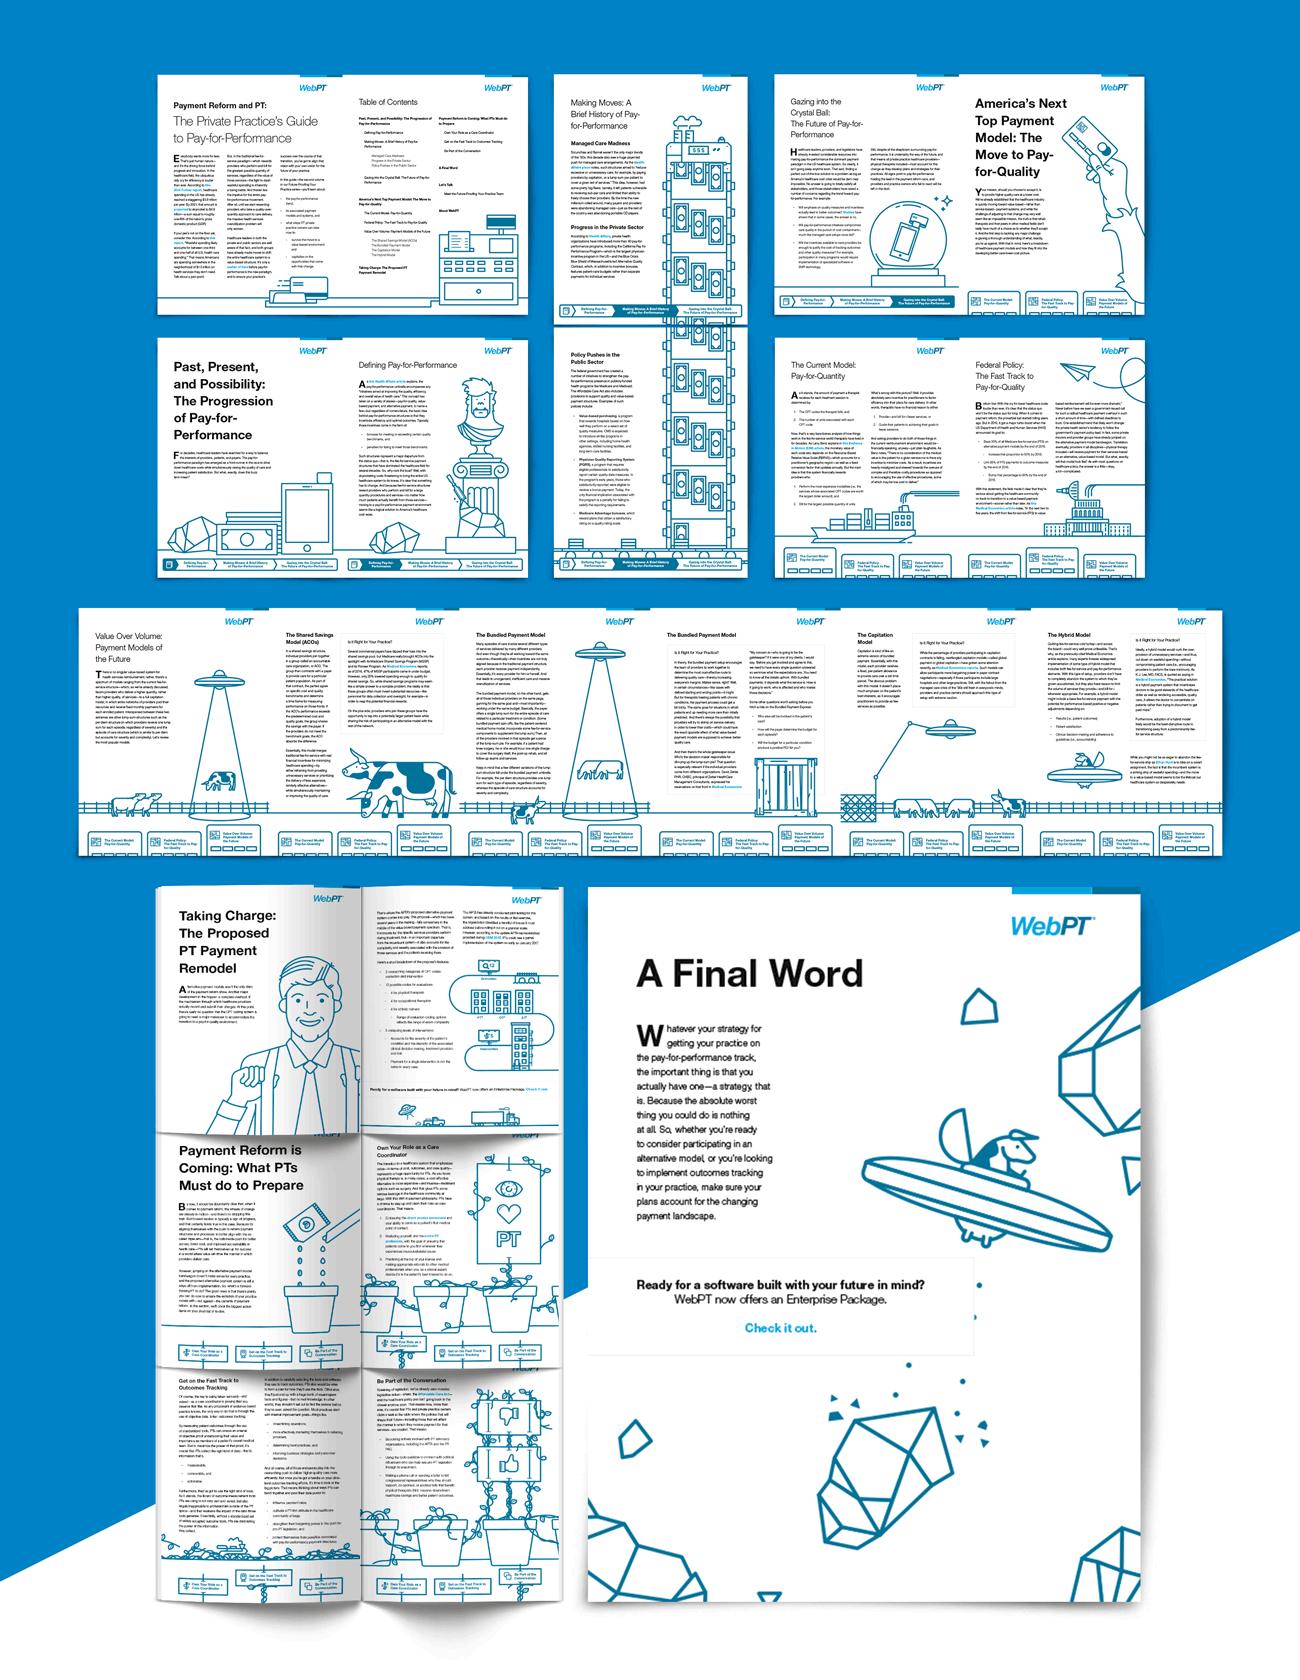 Dot Pixel - WebPT - Payment Reform and PT - Sales/Marketing Collateral Design